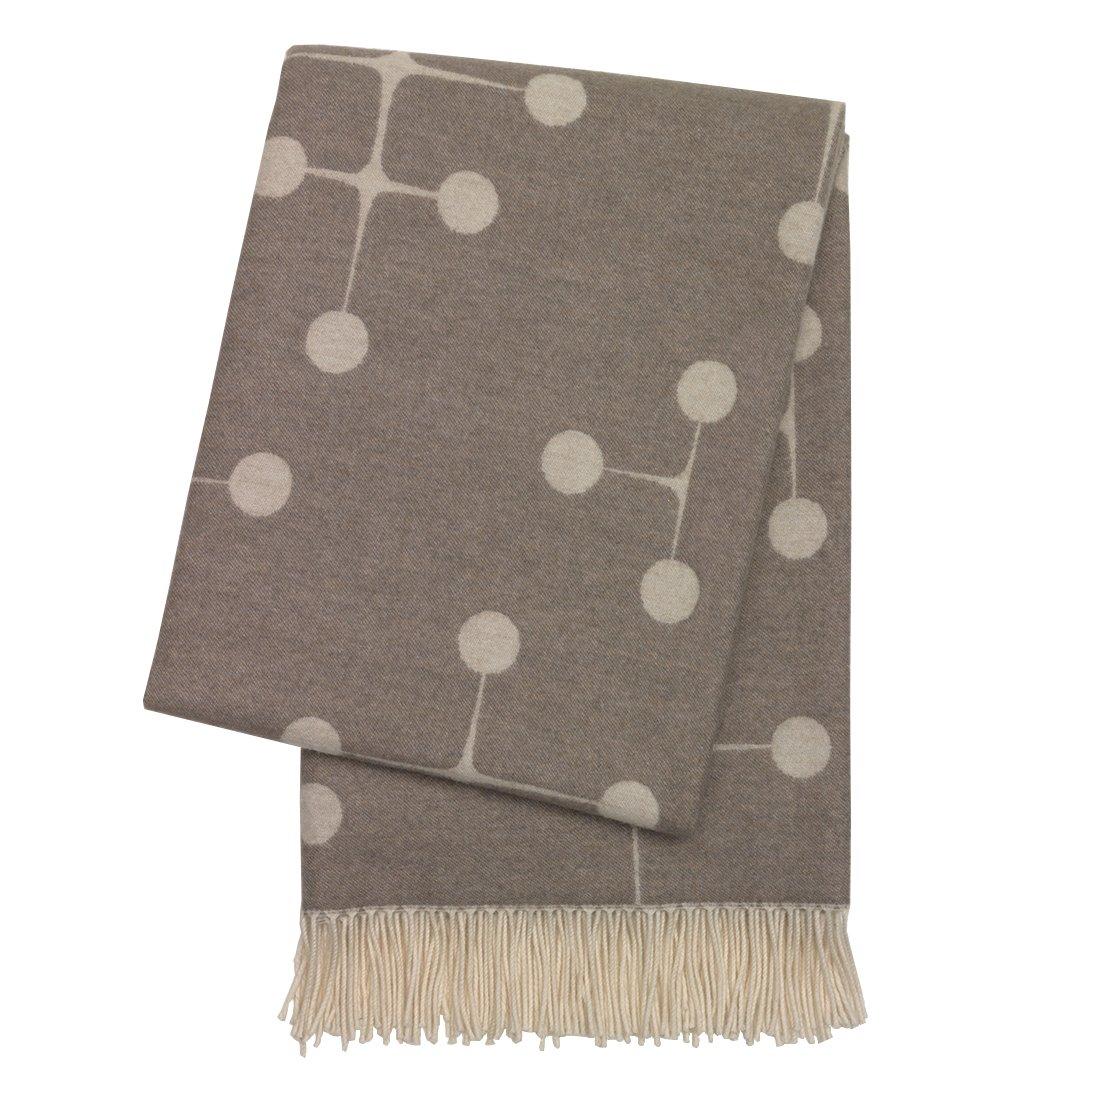 Vitra Eames Wool Deken Taupe